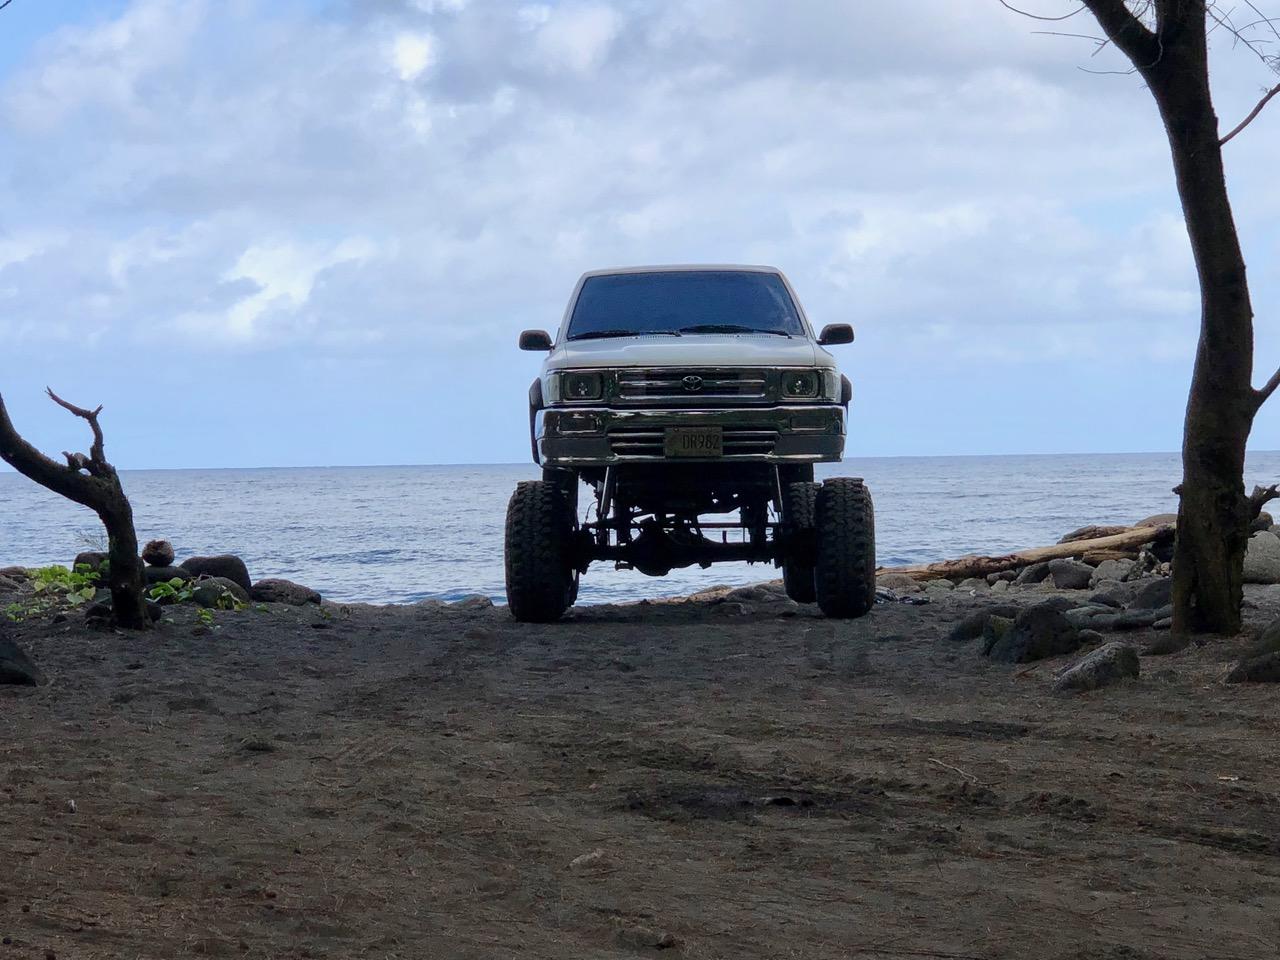 Jacked up trucks in Hawai'i are very common